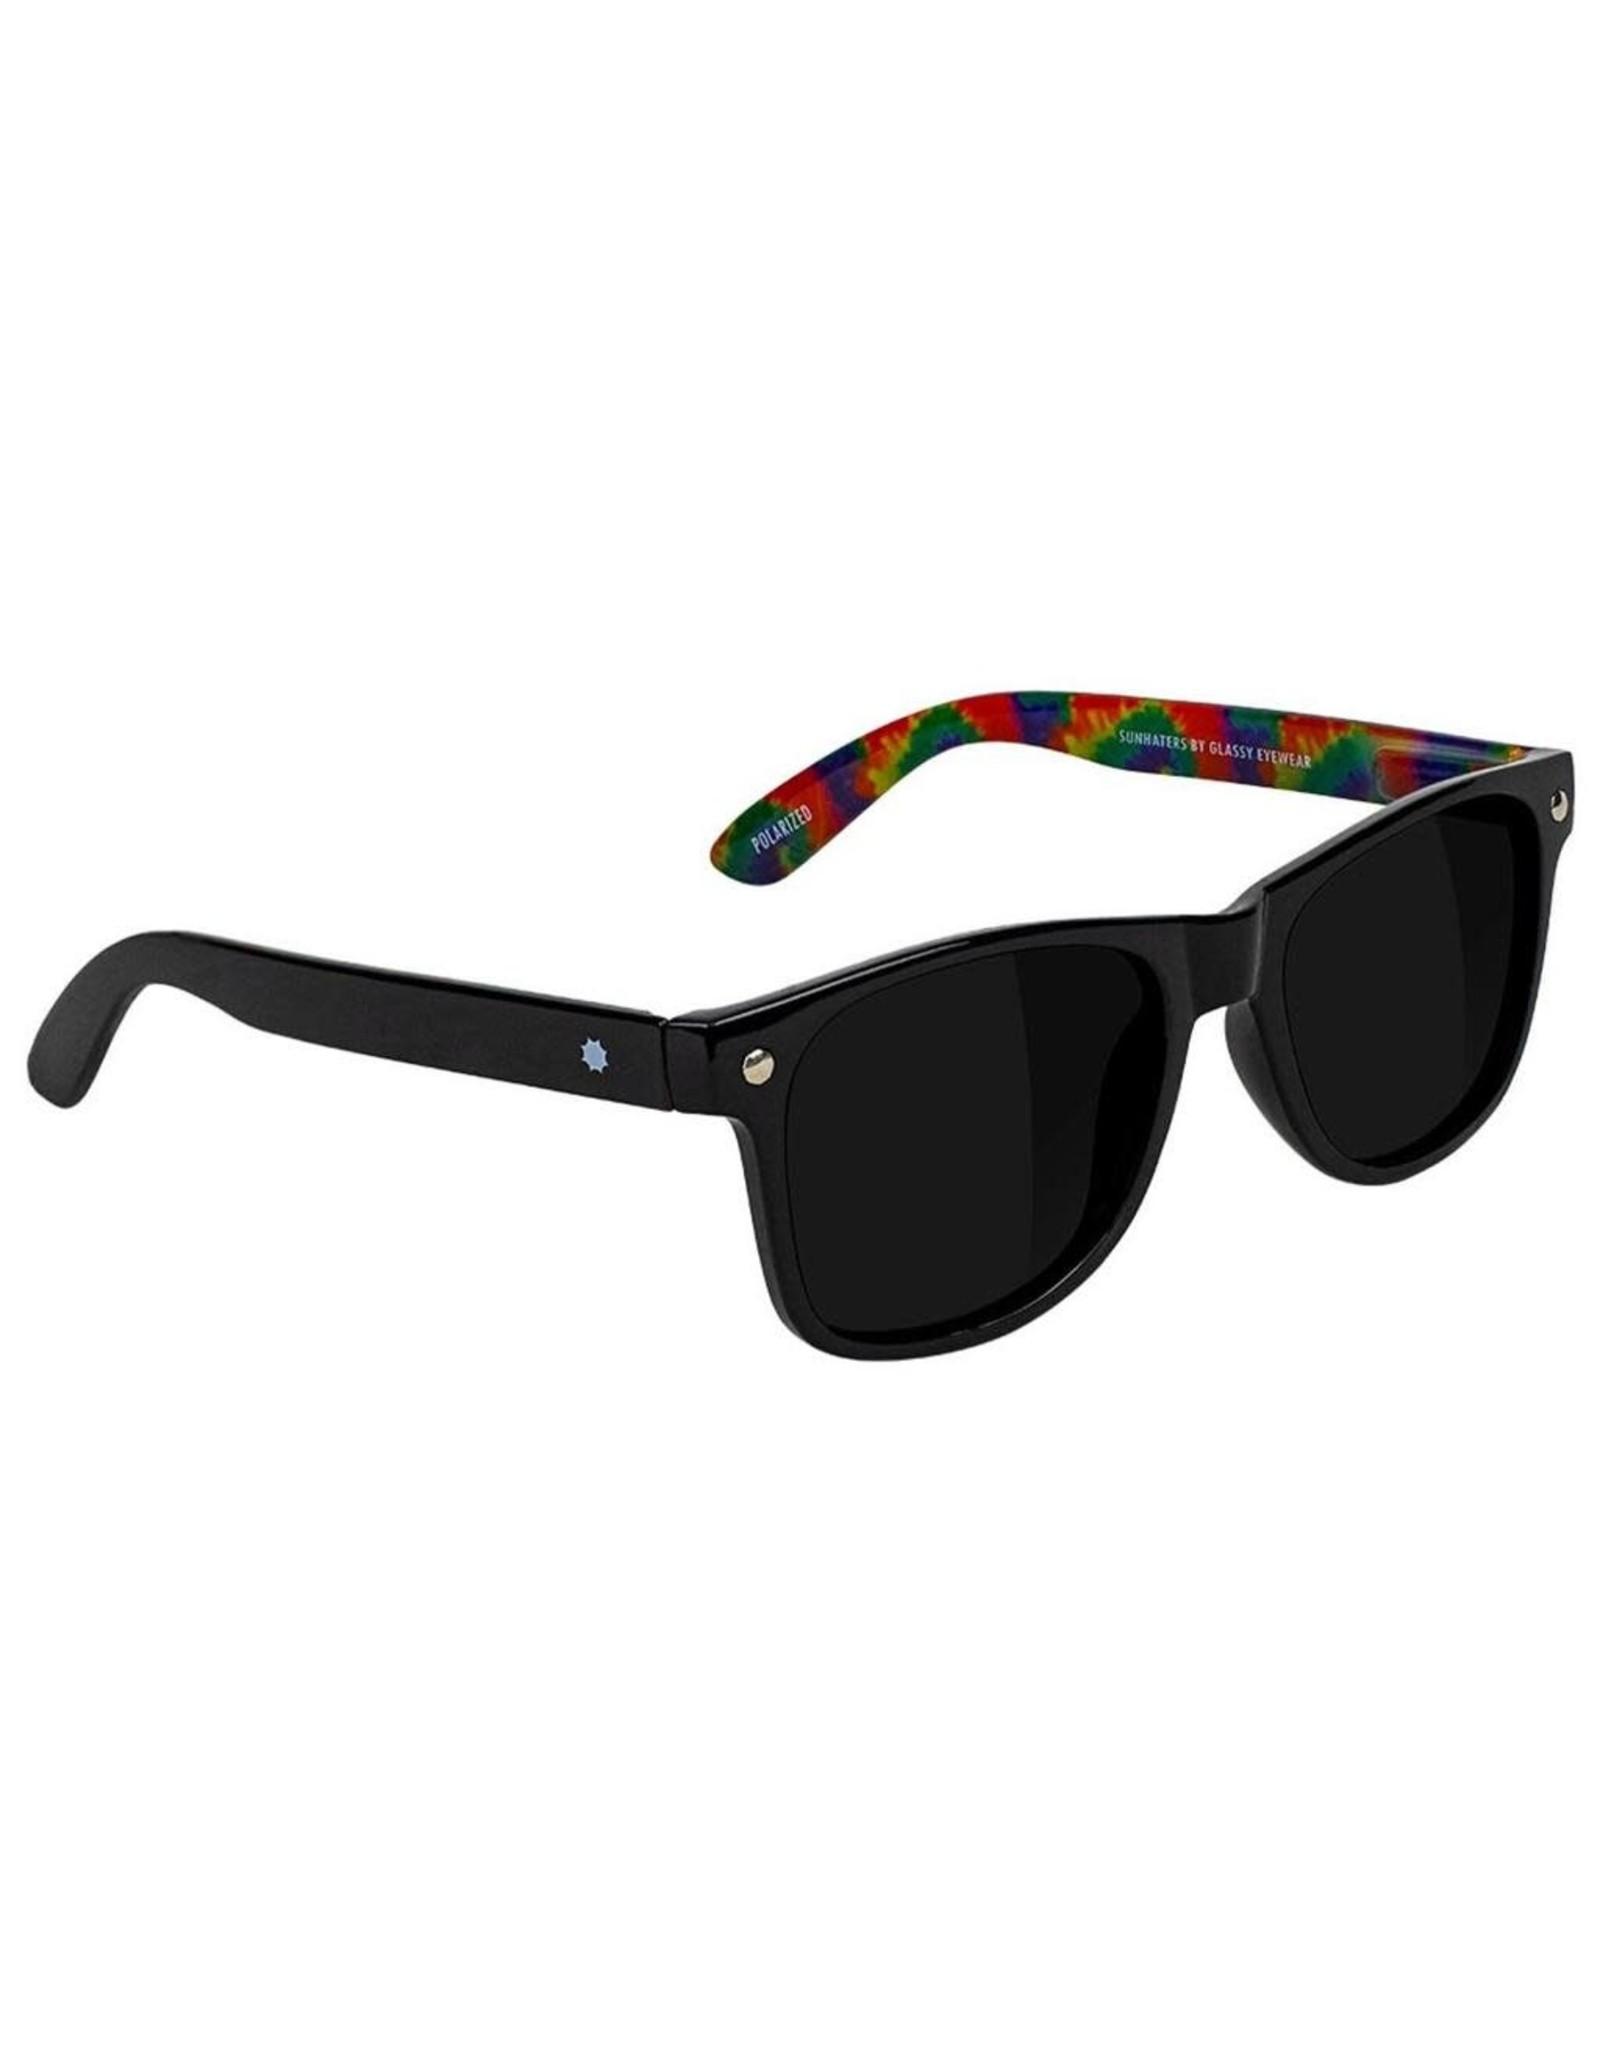 Glassy - Lunette soleil homme leonard polarized black/tie dye